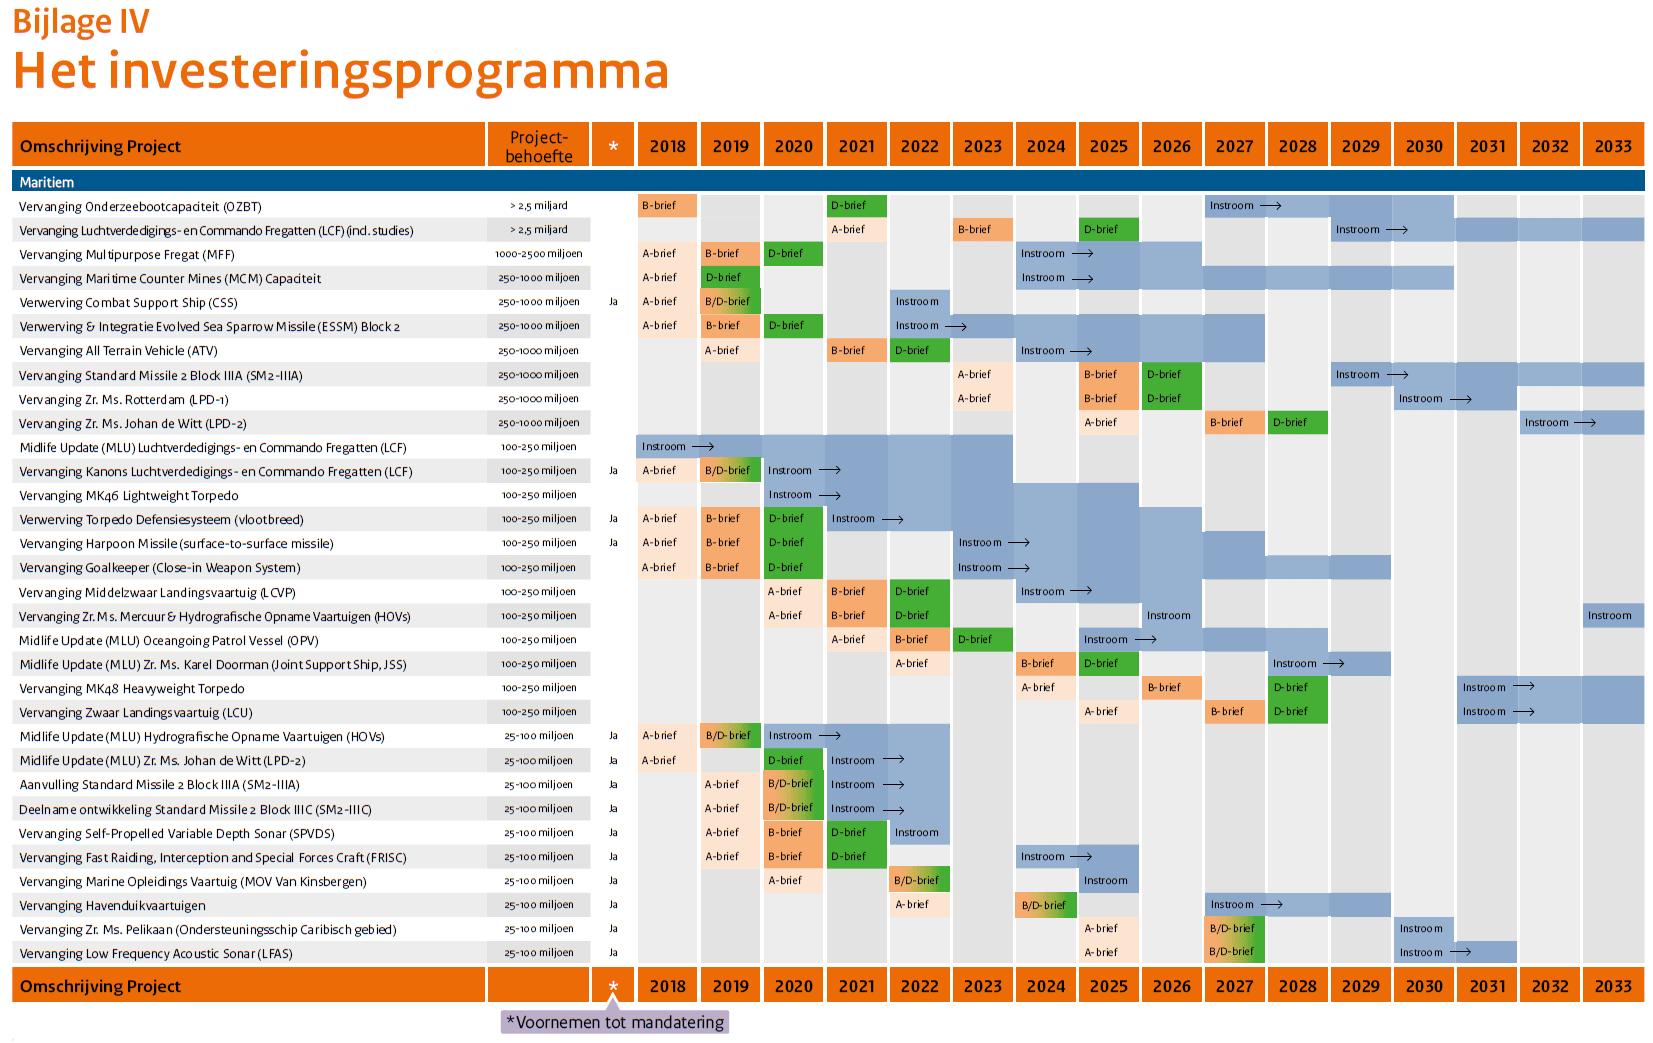 Plan stratégique et marine belge horizon 2030 - Page 14 Mmkk4413